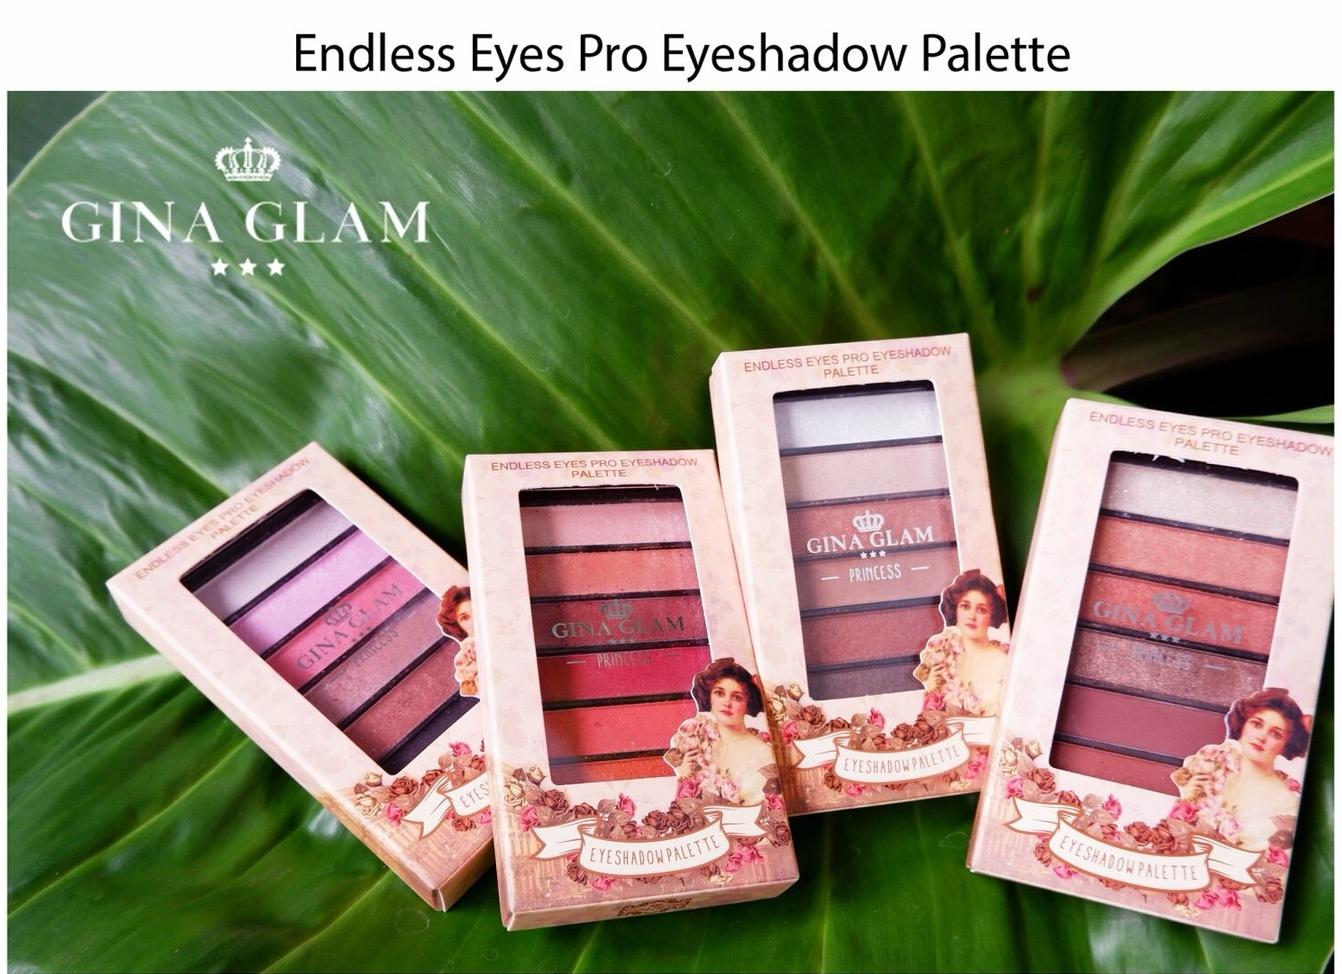 Gina glam endless eyes pro eyeshadow palette พาเลทอายแชโดว์ 6 สีสันพาเลทพกพาสะดวกสะดวก